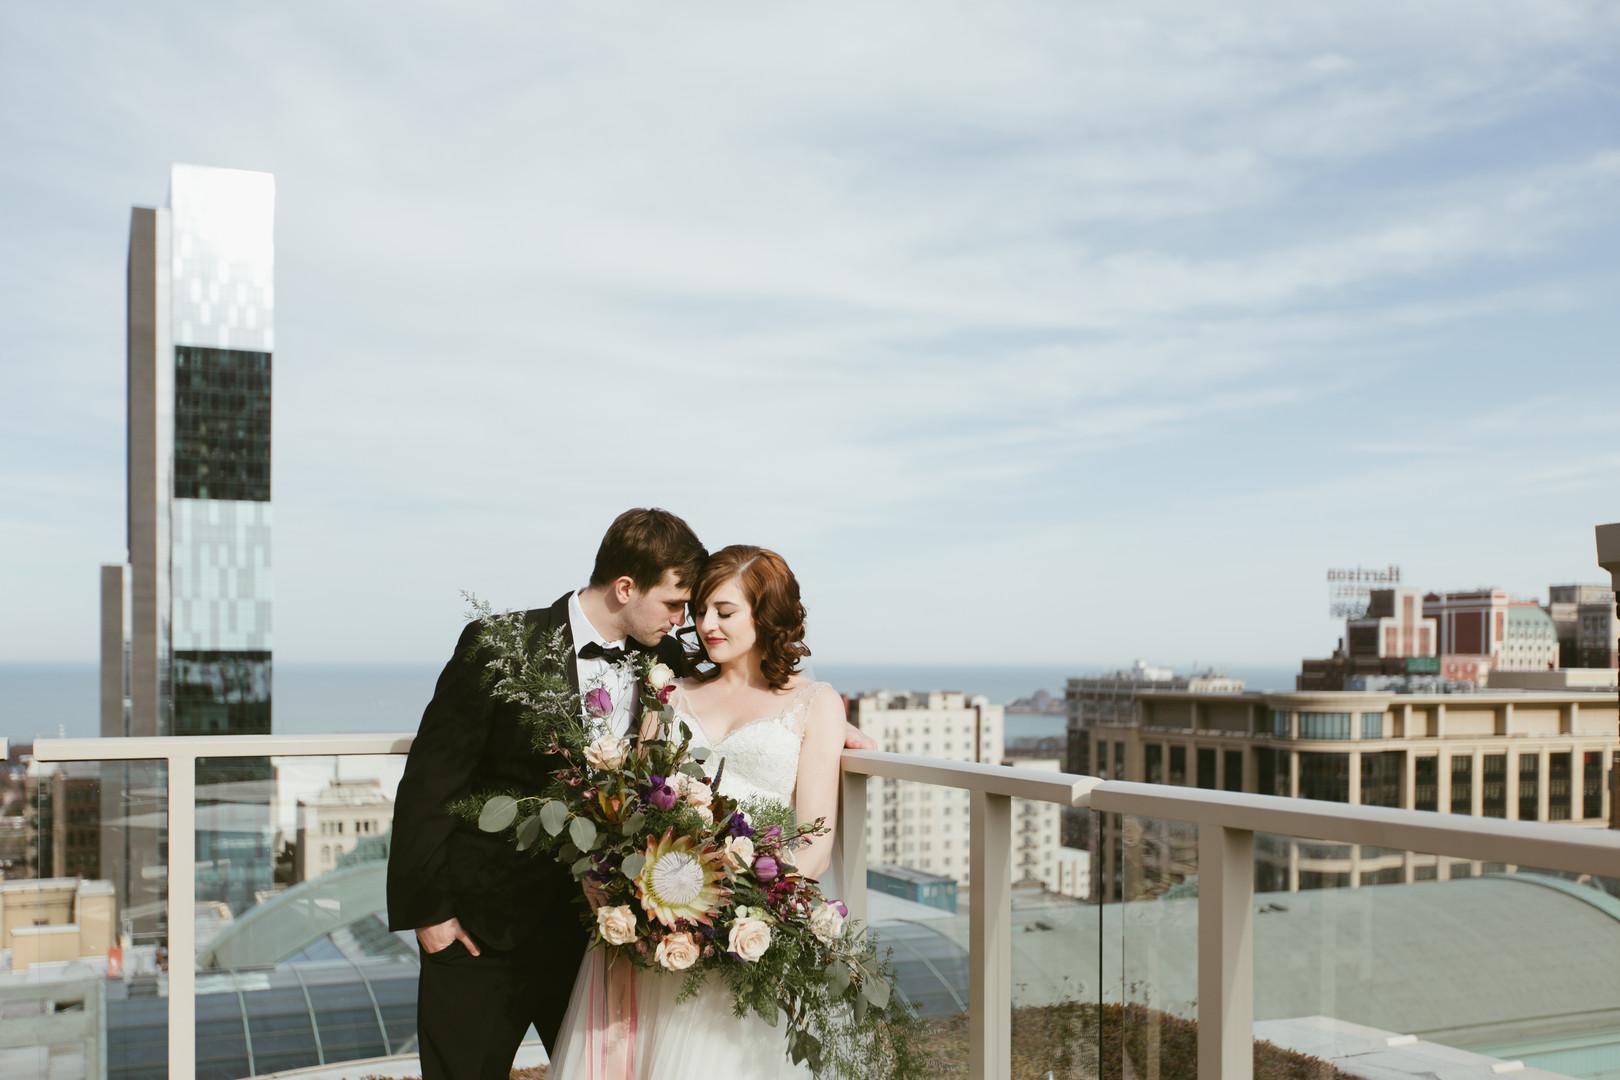 Bride and Groom Romantic Portrait Chicago Wedding Stephanie Wood Photography